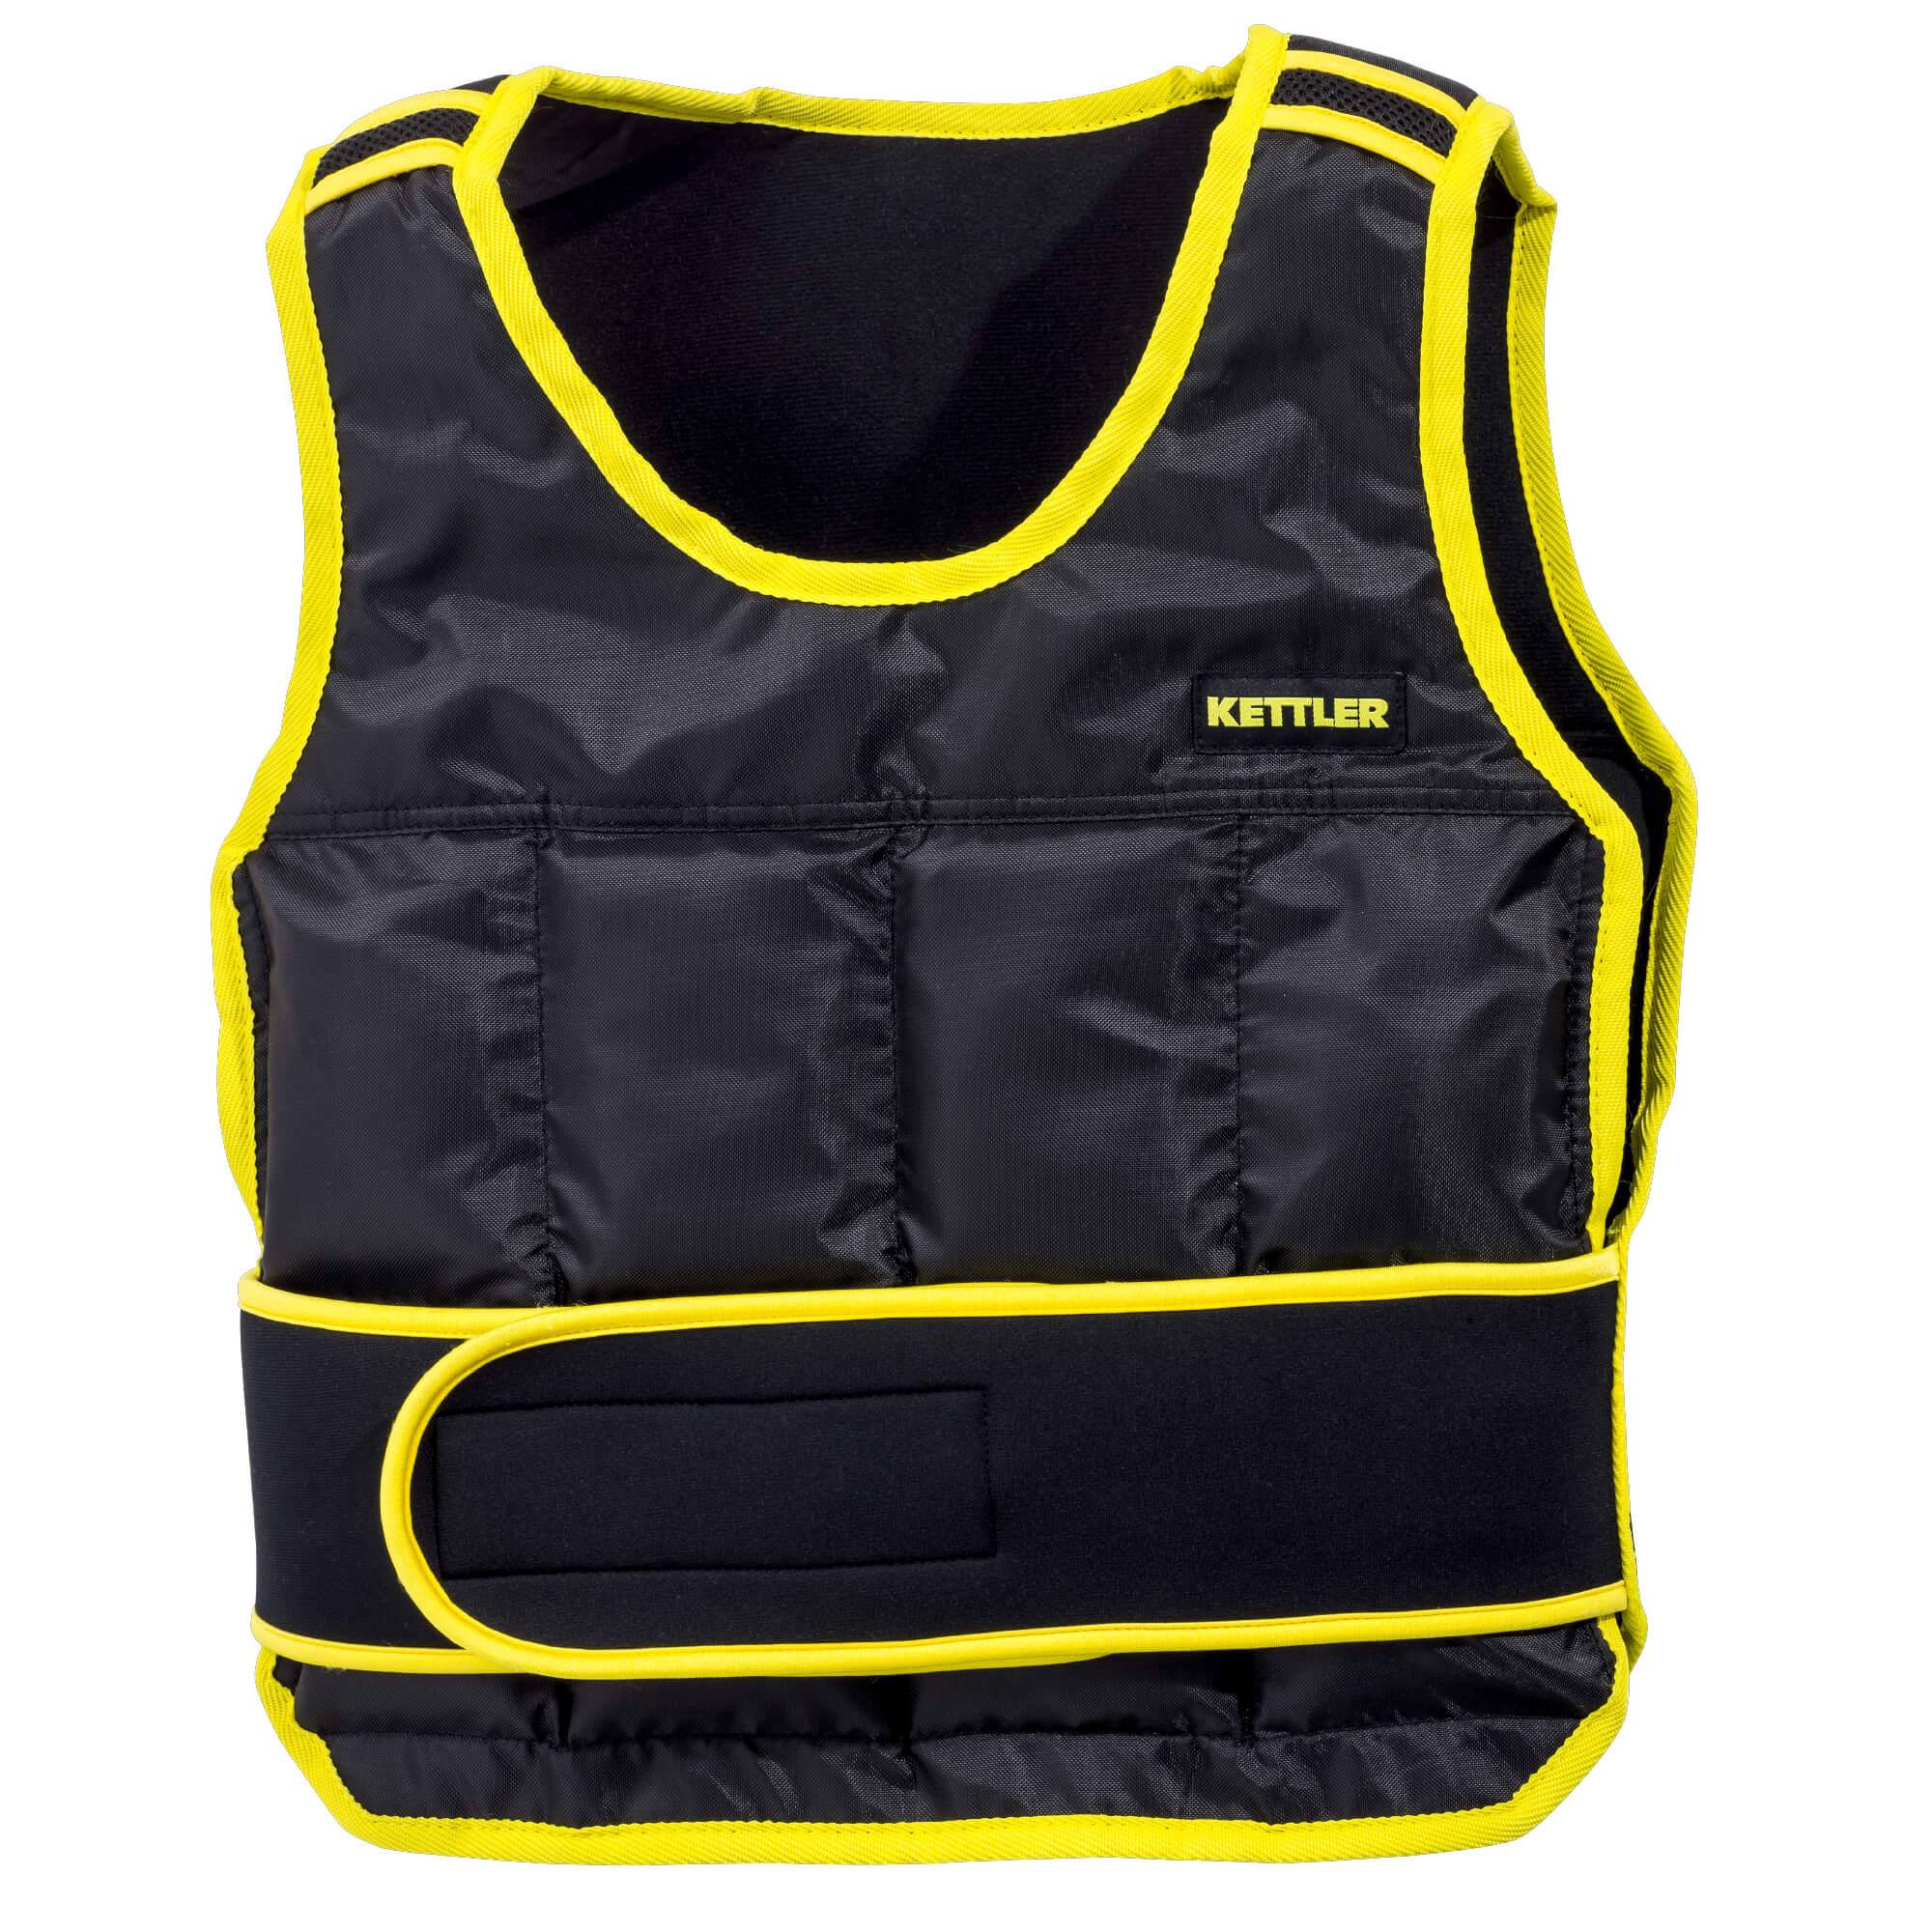 Weights Vest Basic Kettler